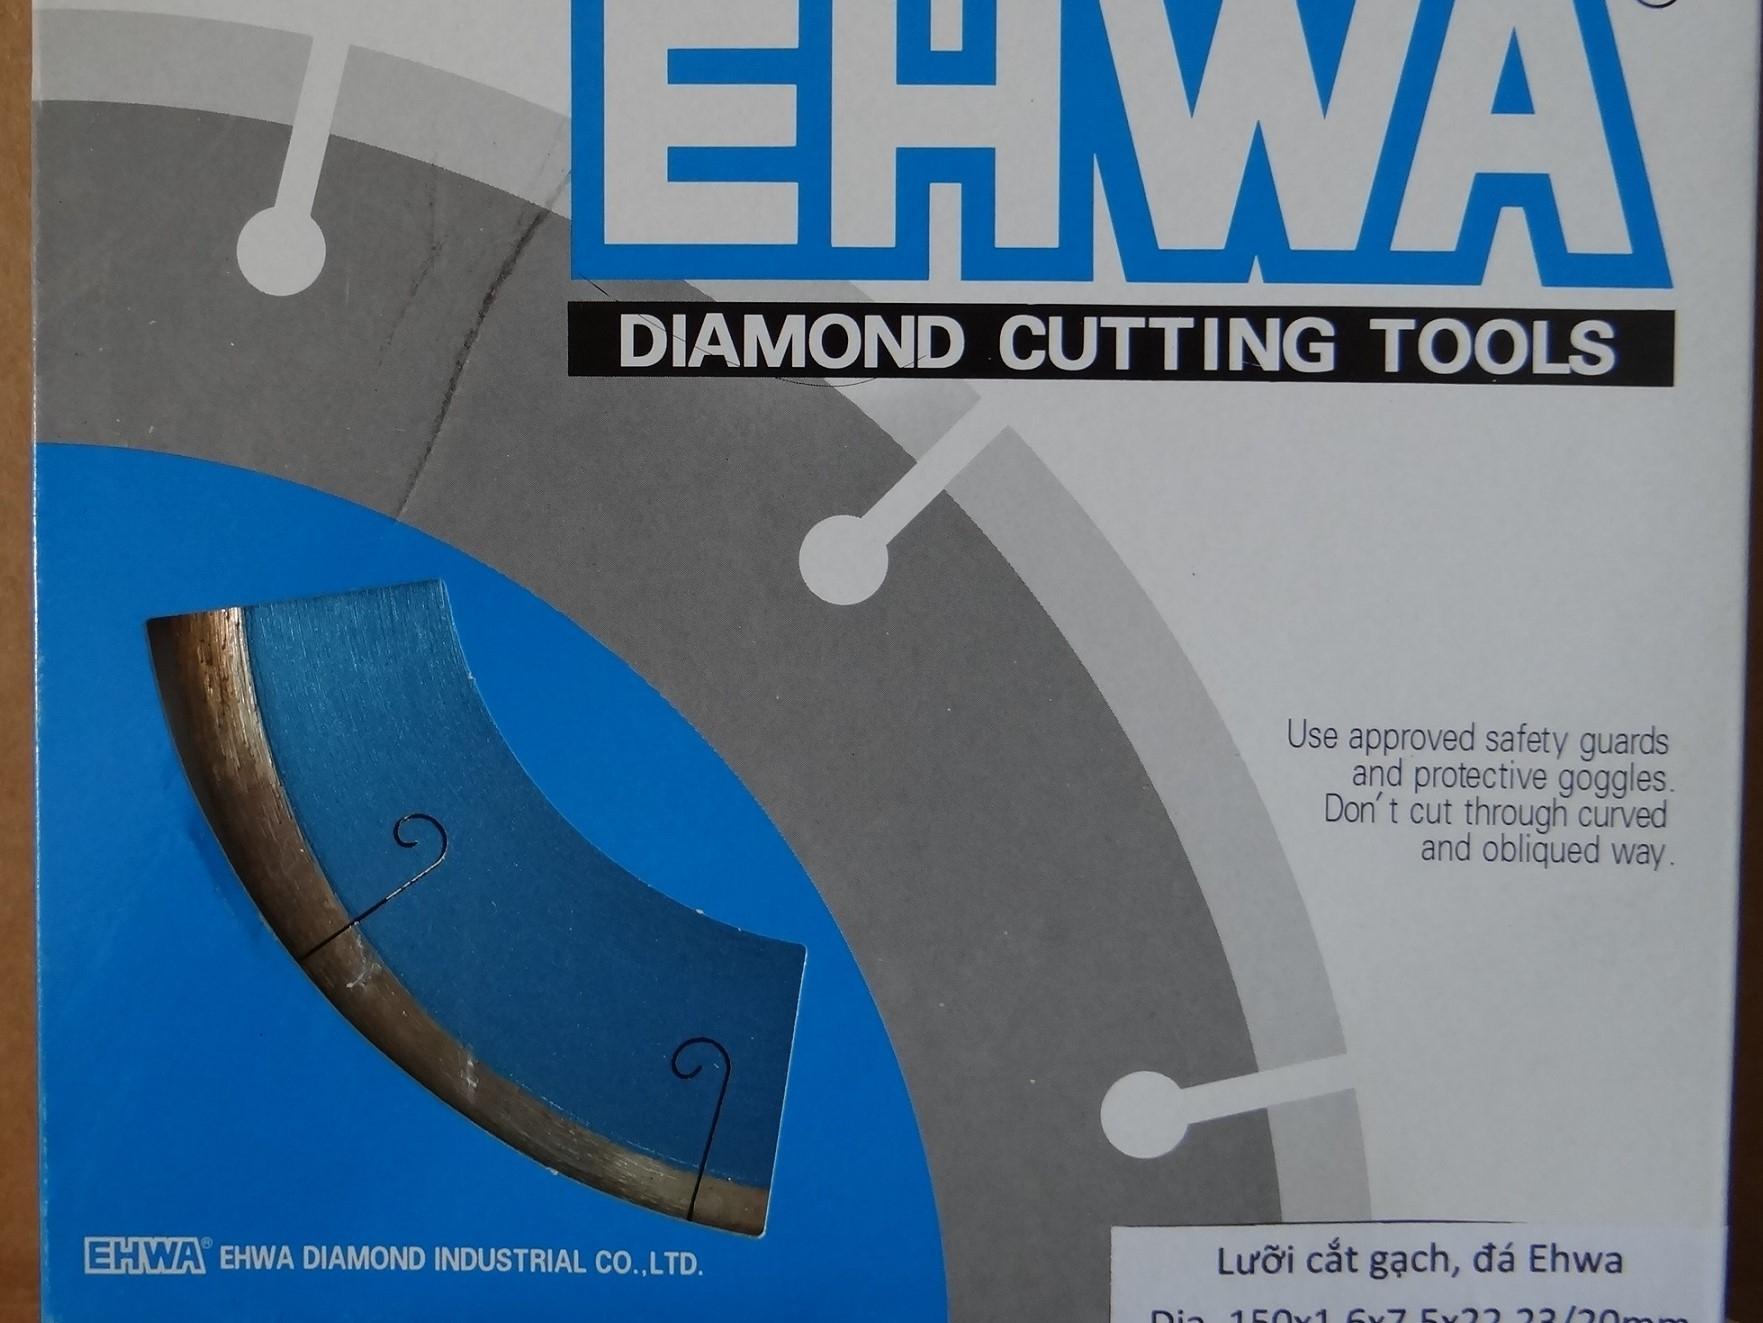 Lưỡi cắt gạch, đá Ehwa 150 Premium - Korea